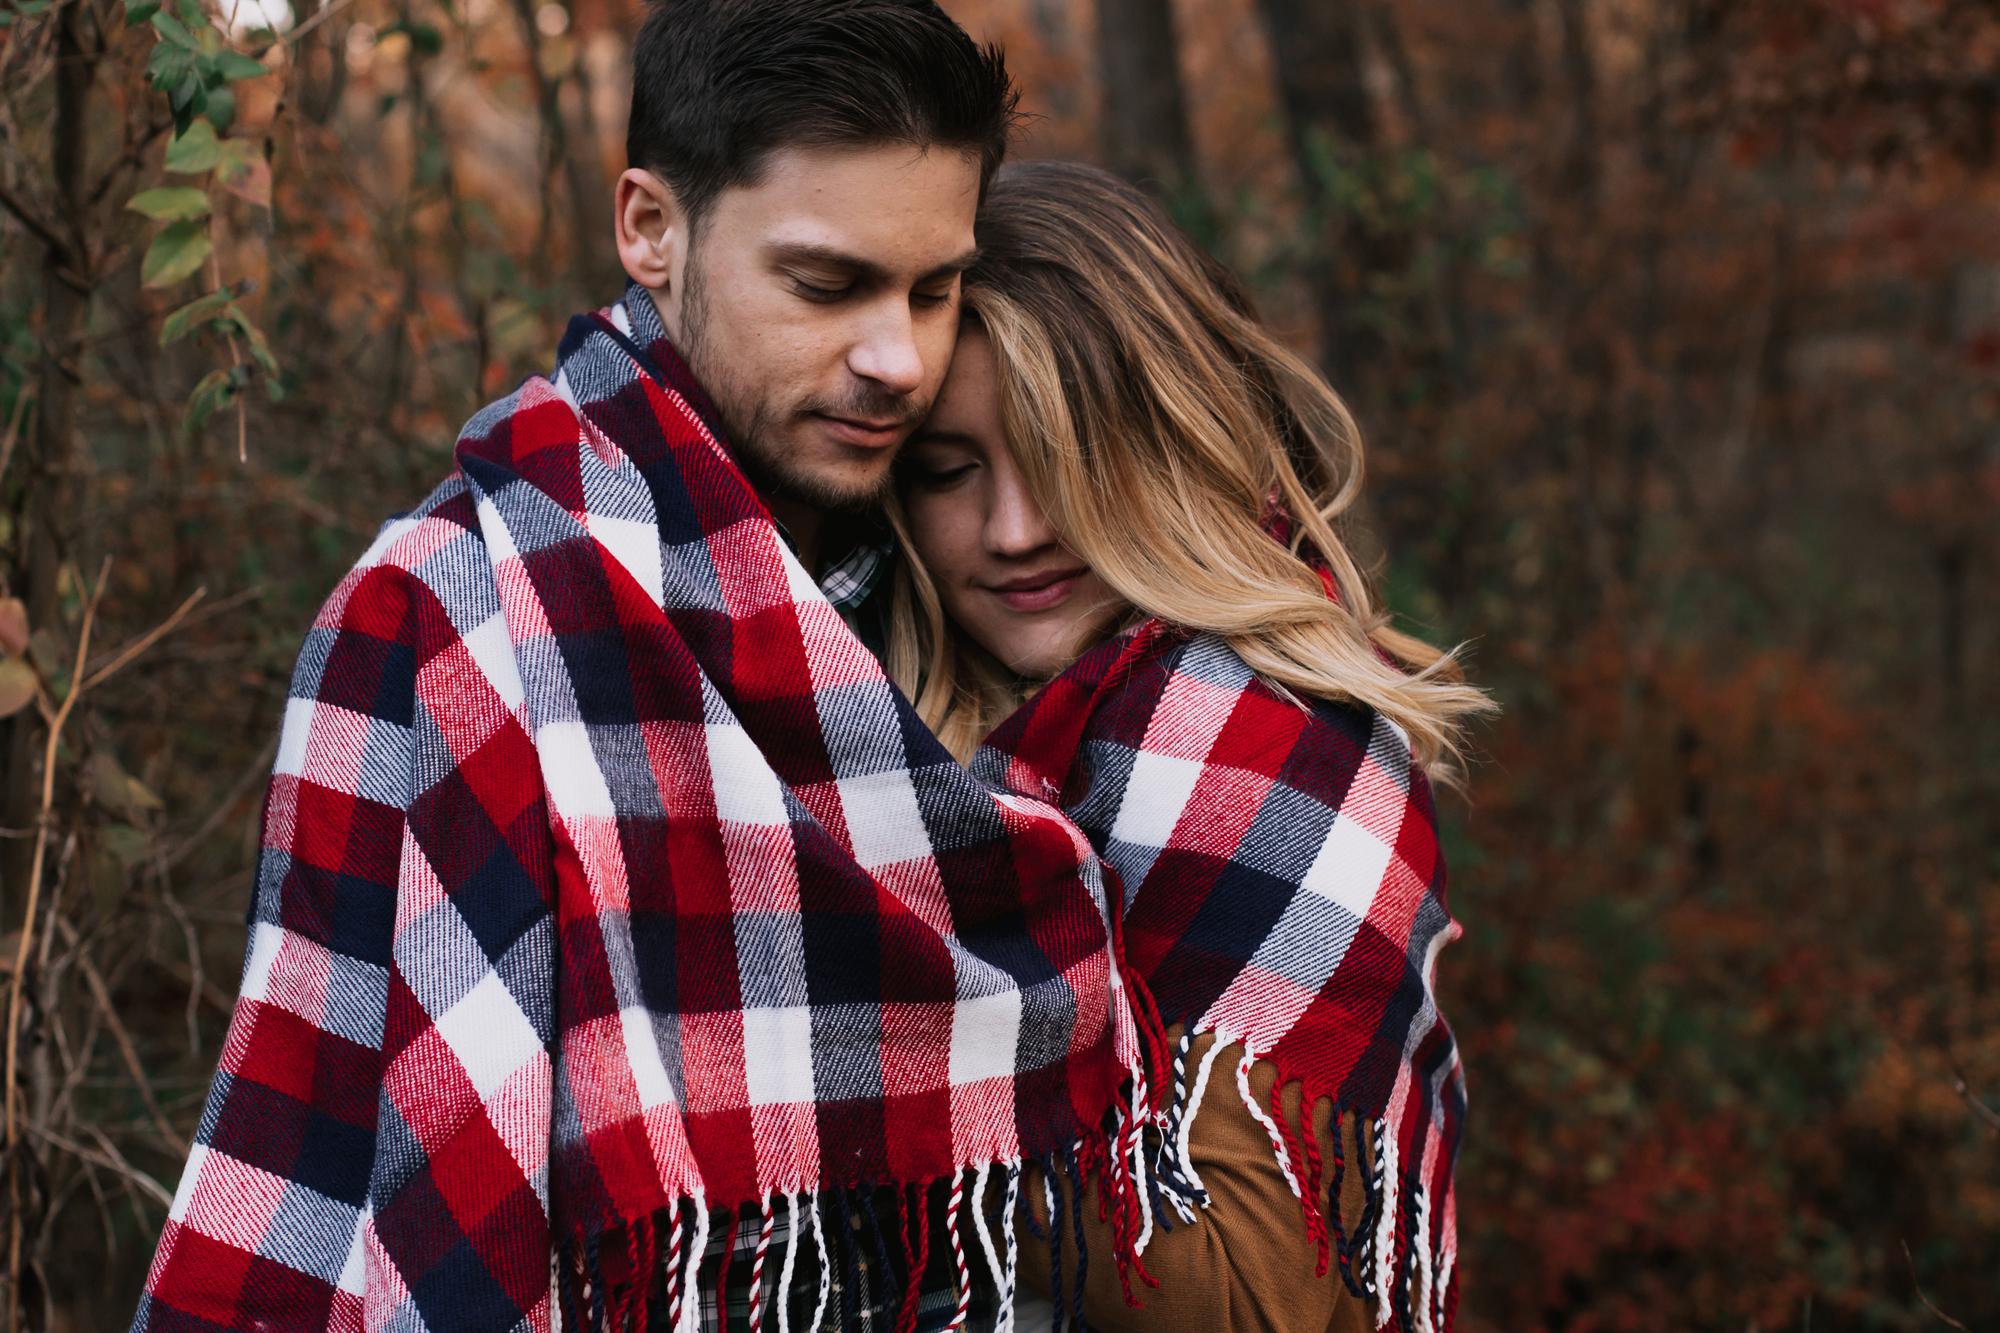 jacobsburg-state-park-easton-pa-photograph-couple